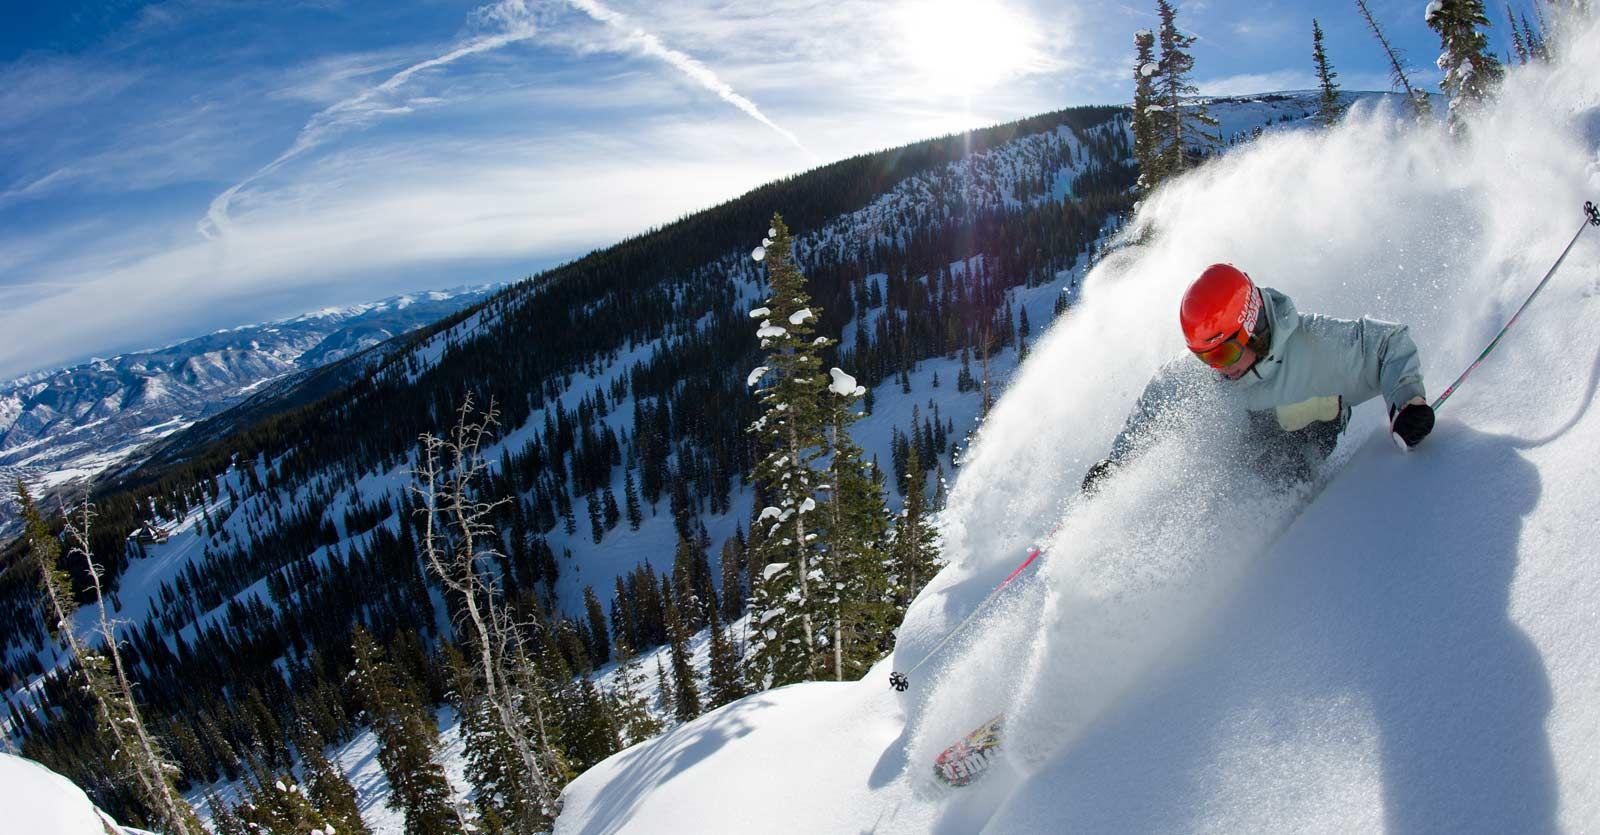 Snowmass Colorado Mountain Information, Lifts, Terrain